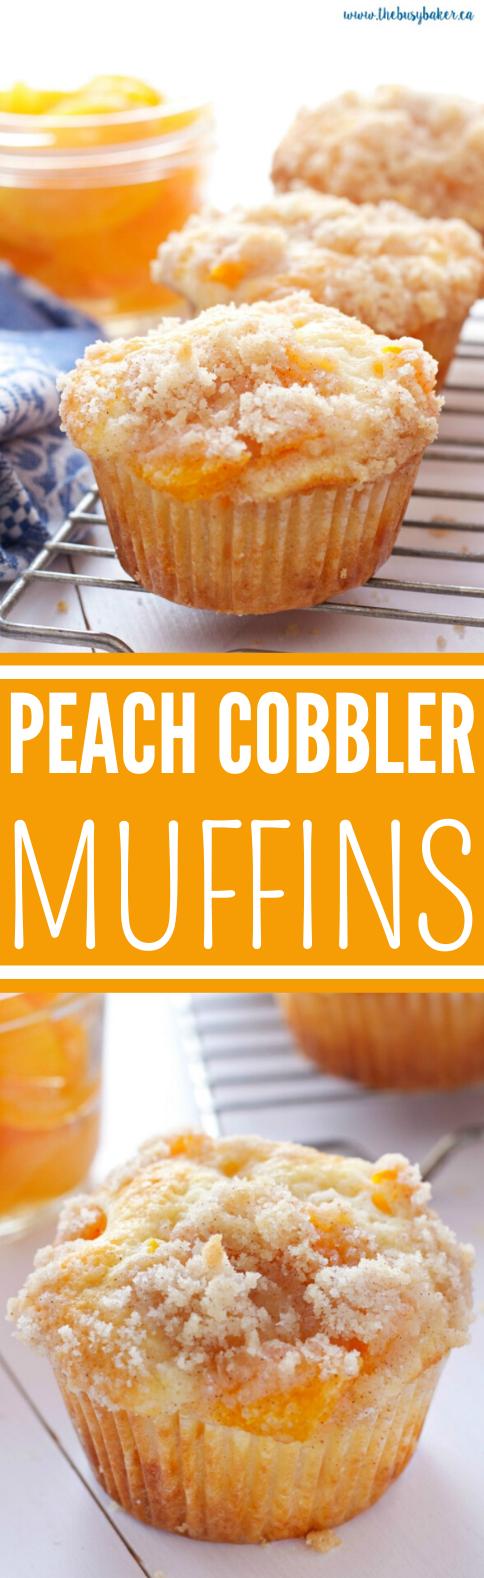 Peach Cobbler Muffins #dessert #baking #muffin #cupcakes #easy